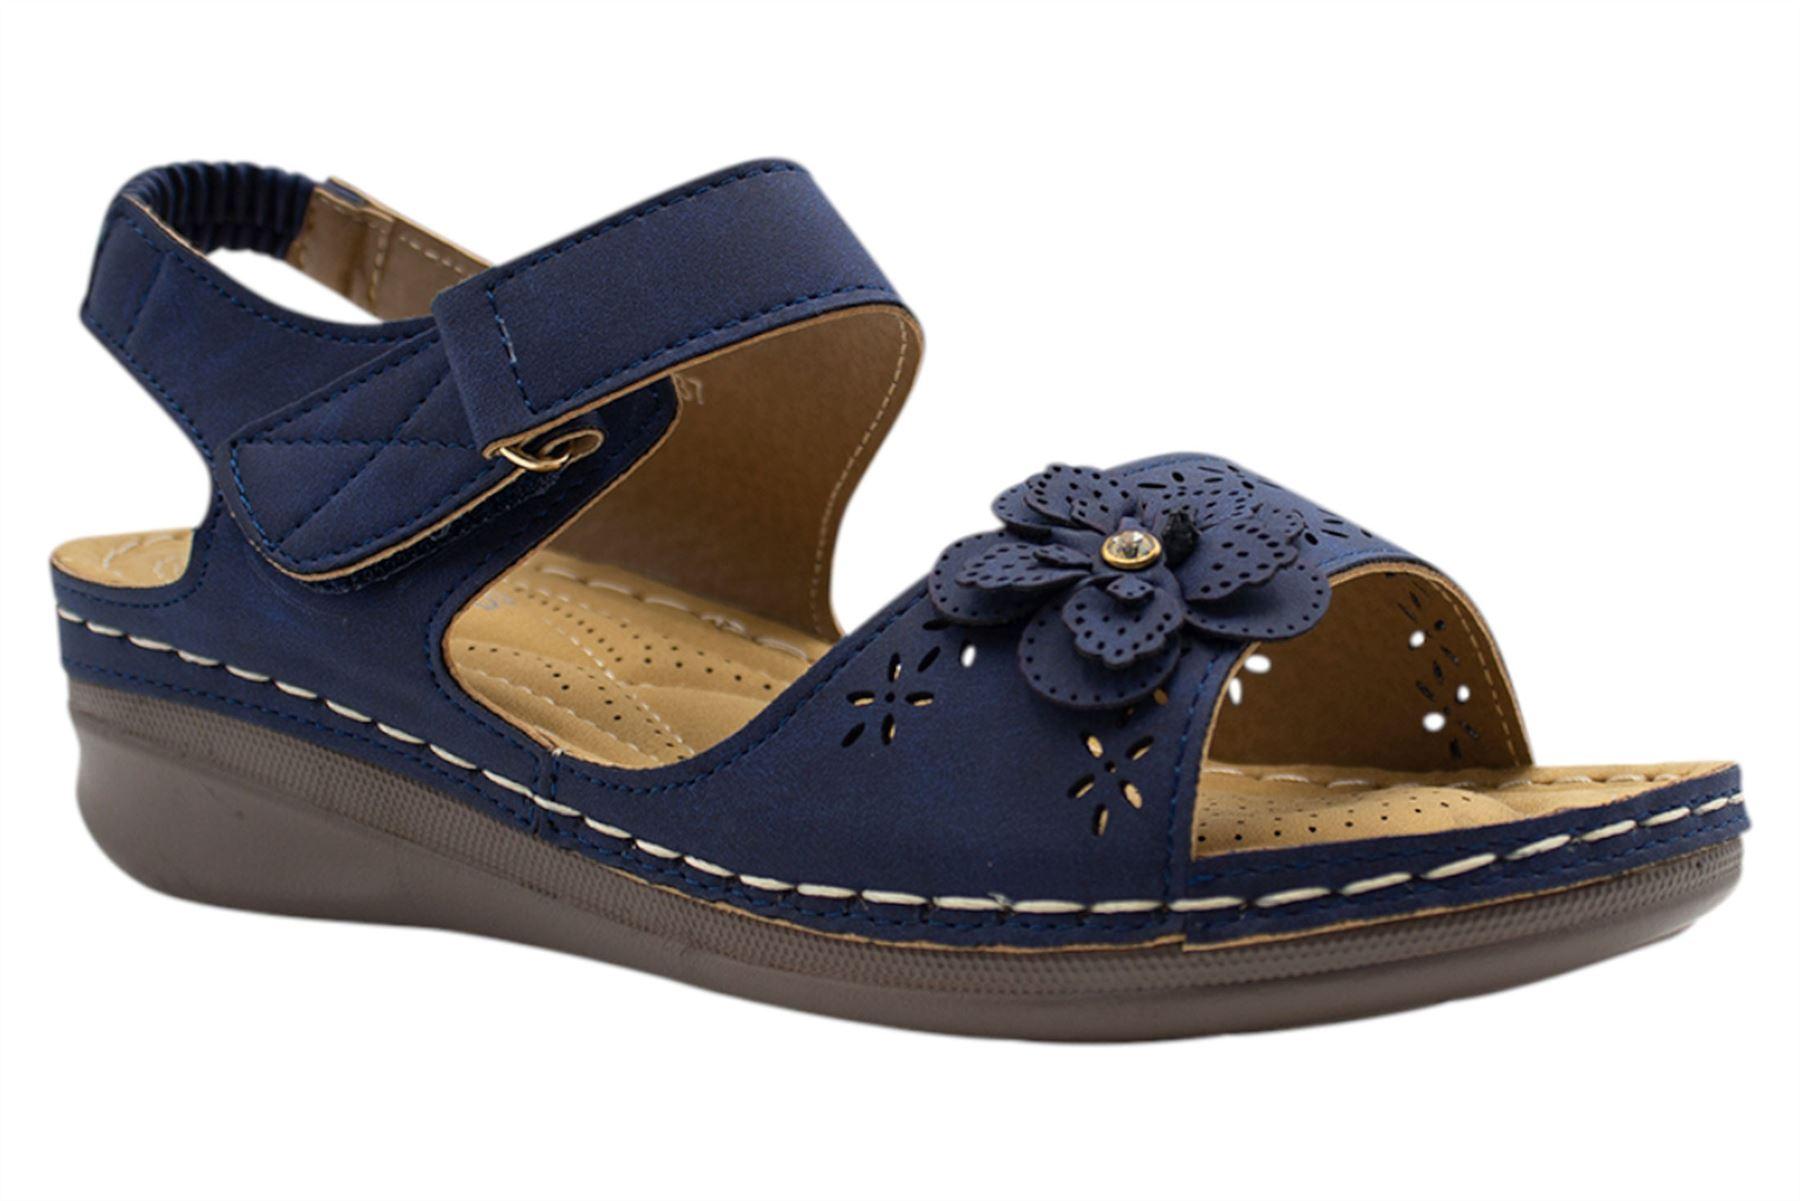 Ladies-Sandals-Womens-Mid-Heel-Comfort-Summer-Beach-Casual-Wear miniatura 33